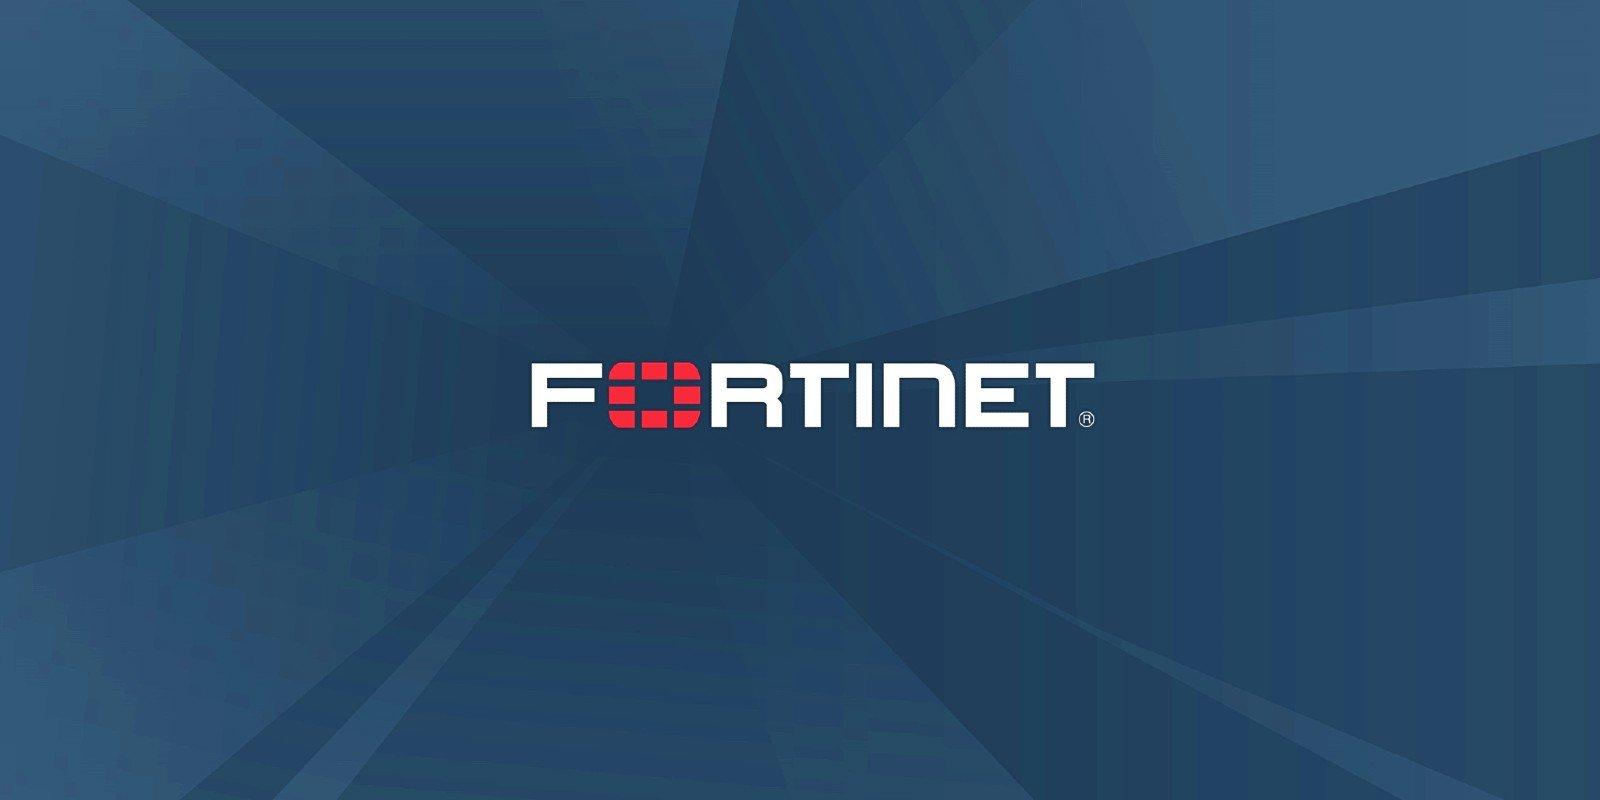 fortinet-corrige-vulnerabilidade-que-poderia-ser-explorada-para-executar-codigo-arbitrario